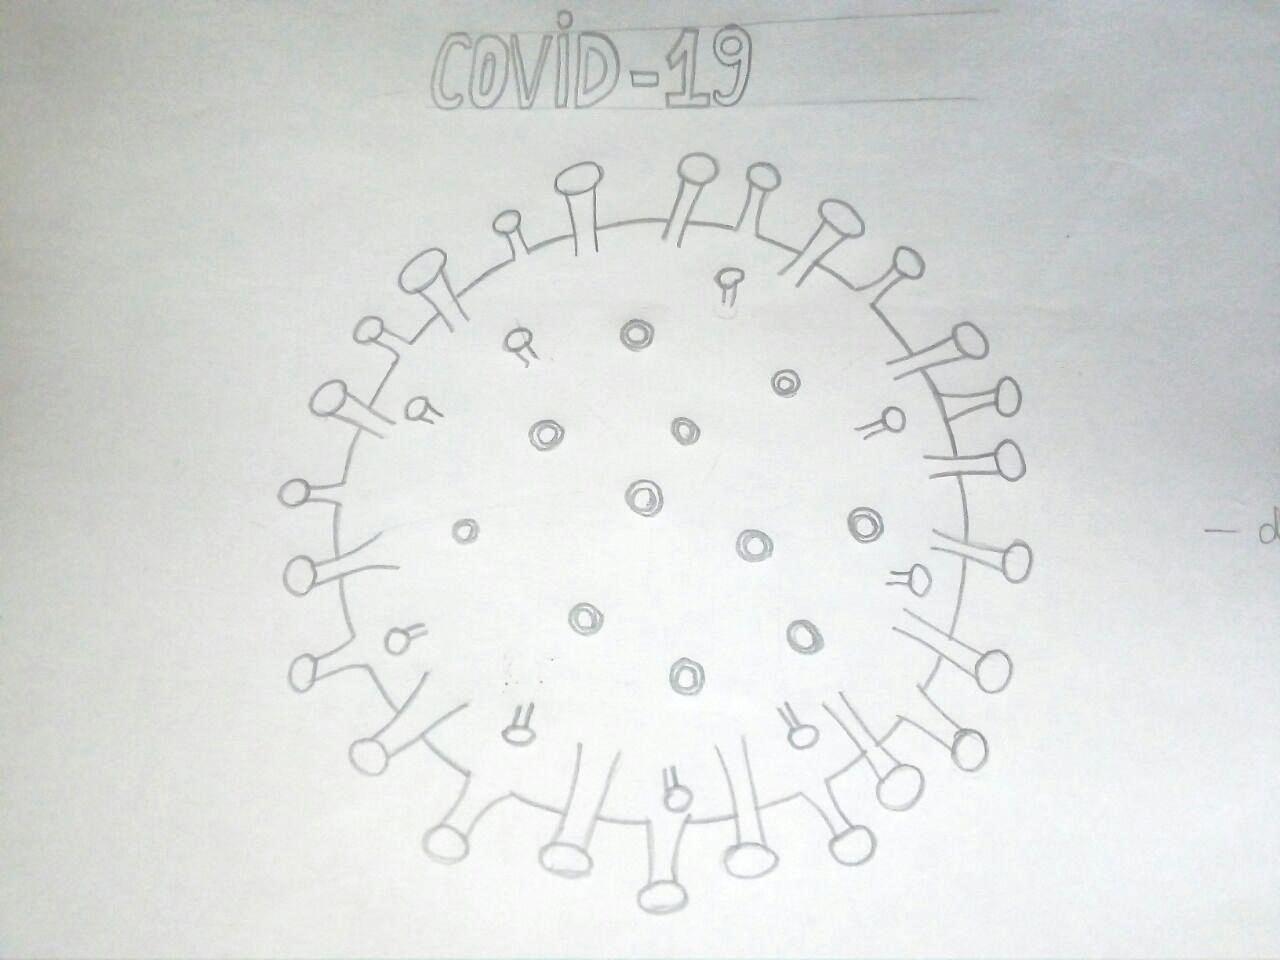 Как нарисовать коронавирус карандашом